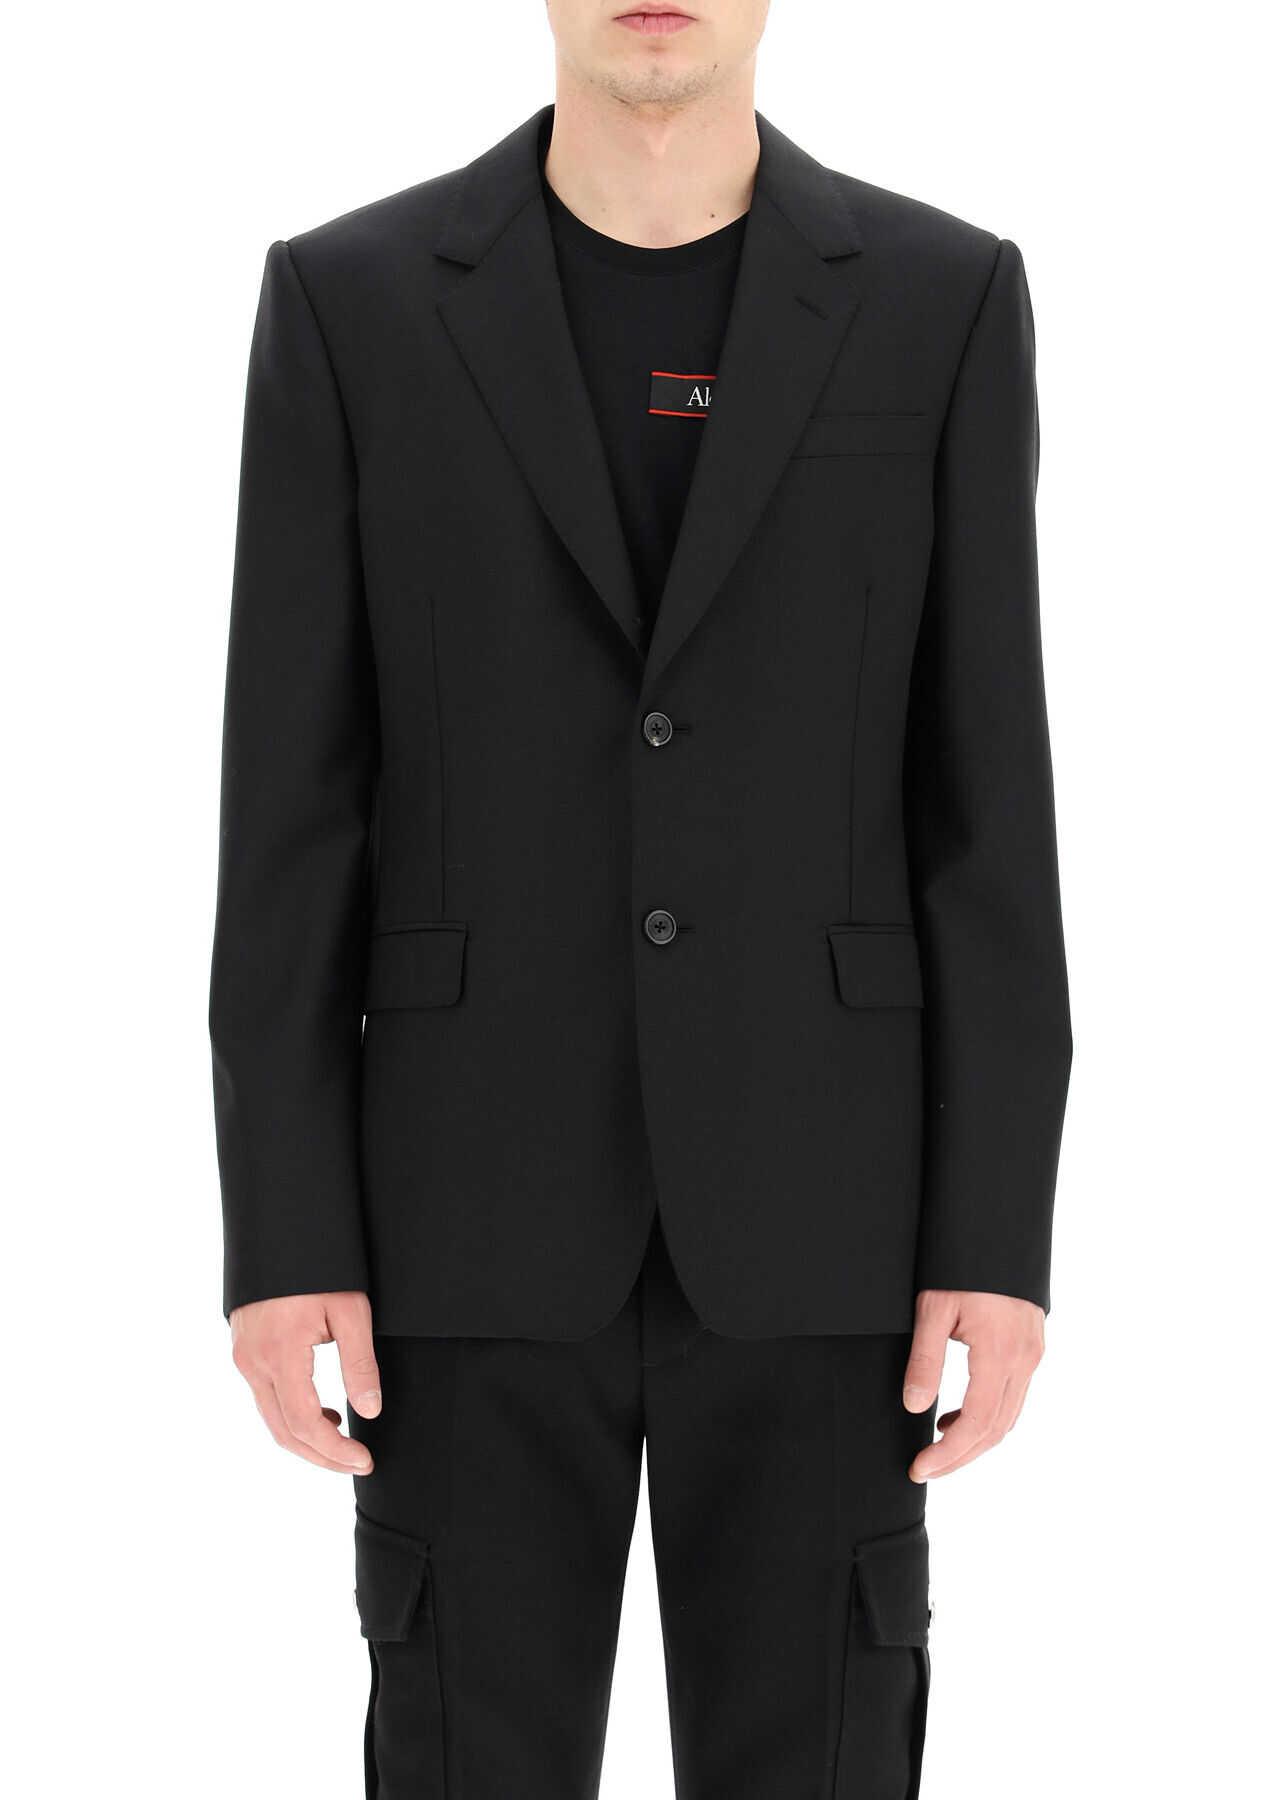 Alexander McQueen Wool And Mohair Blazer BLACK imagine